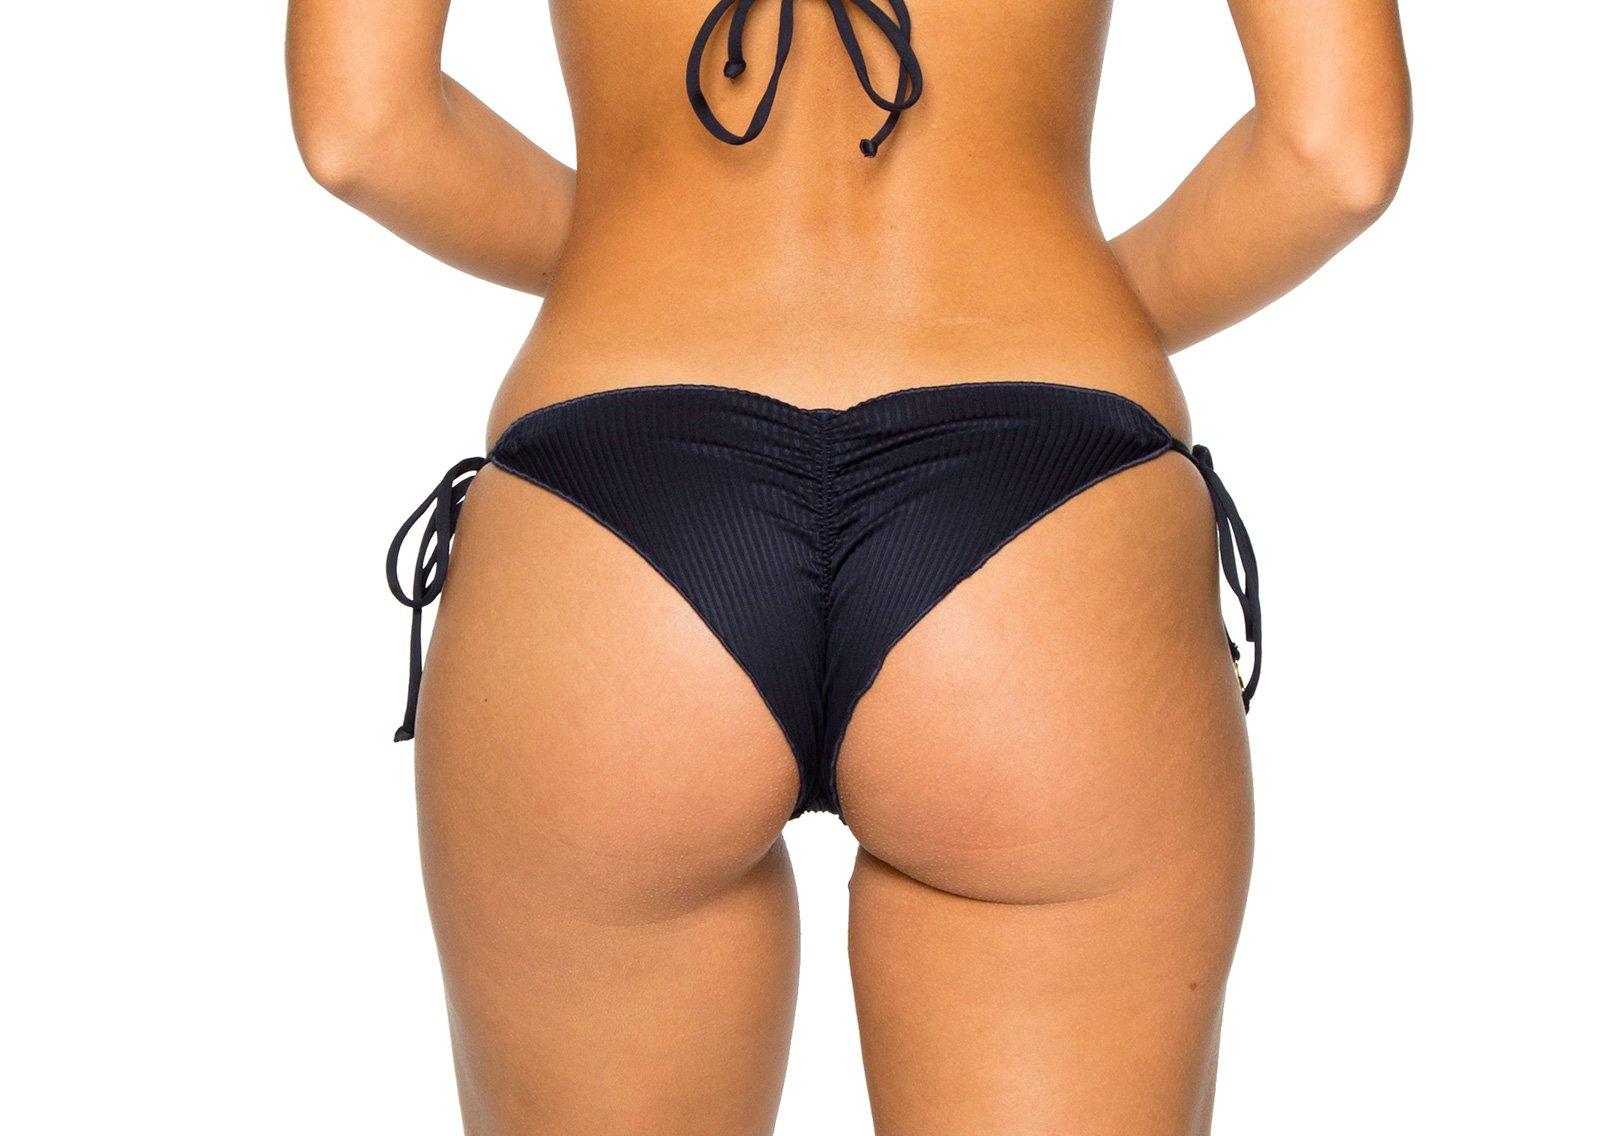 a18dc87a962 ... Side-tie scrunch black Brazilian bikini bottom - BOTTOM SEAMLESS MAR  COSTA DEL SOL ...